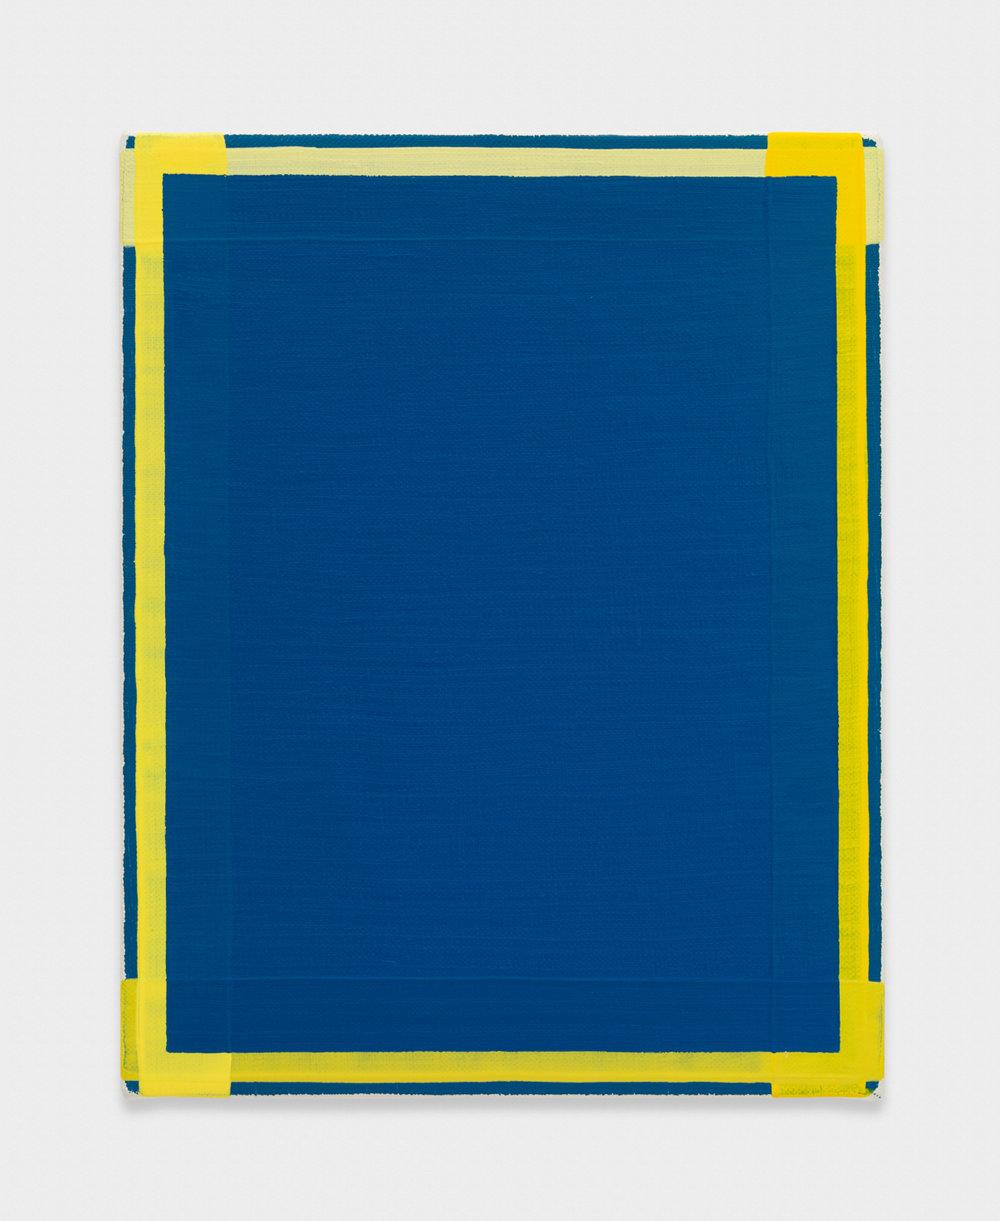 Yui Yaegashi  yellow  2017 Oil on canvas 9 ⅝h x 7 ½w in YY105